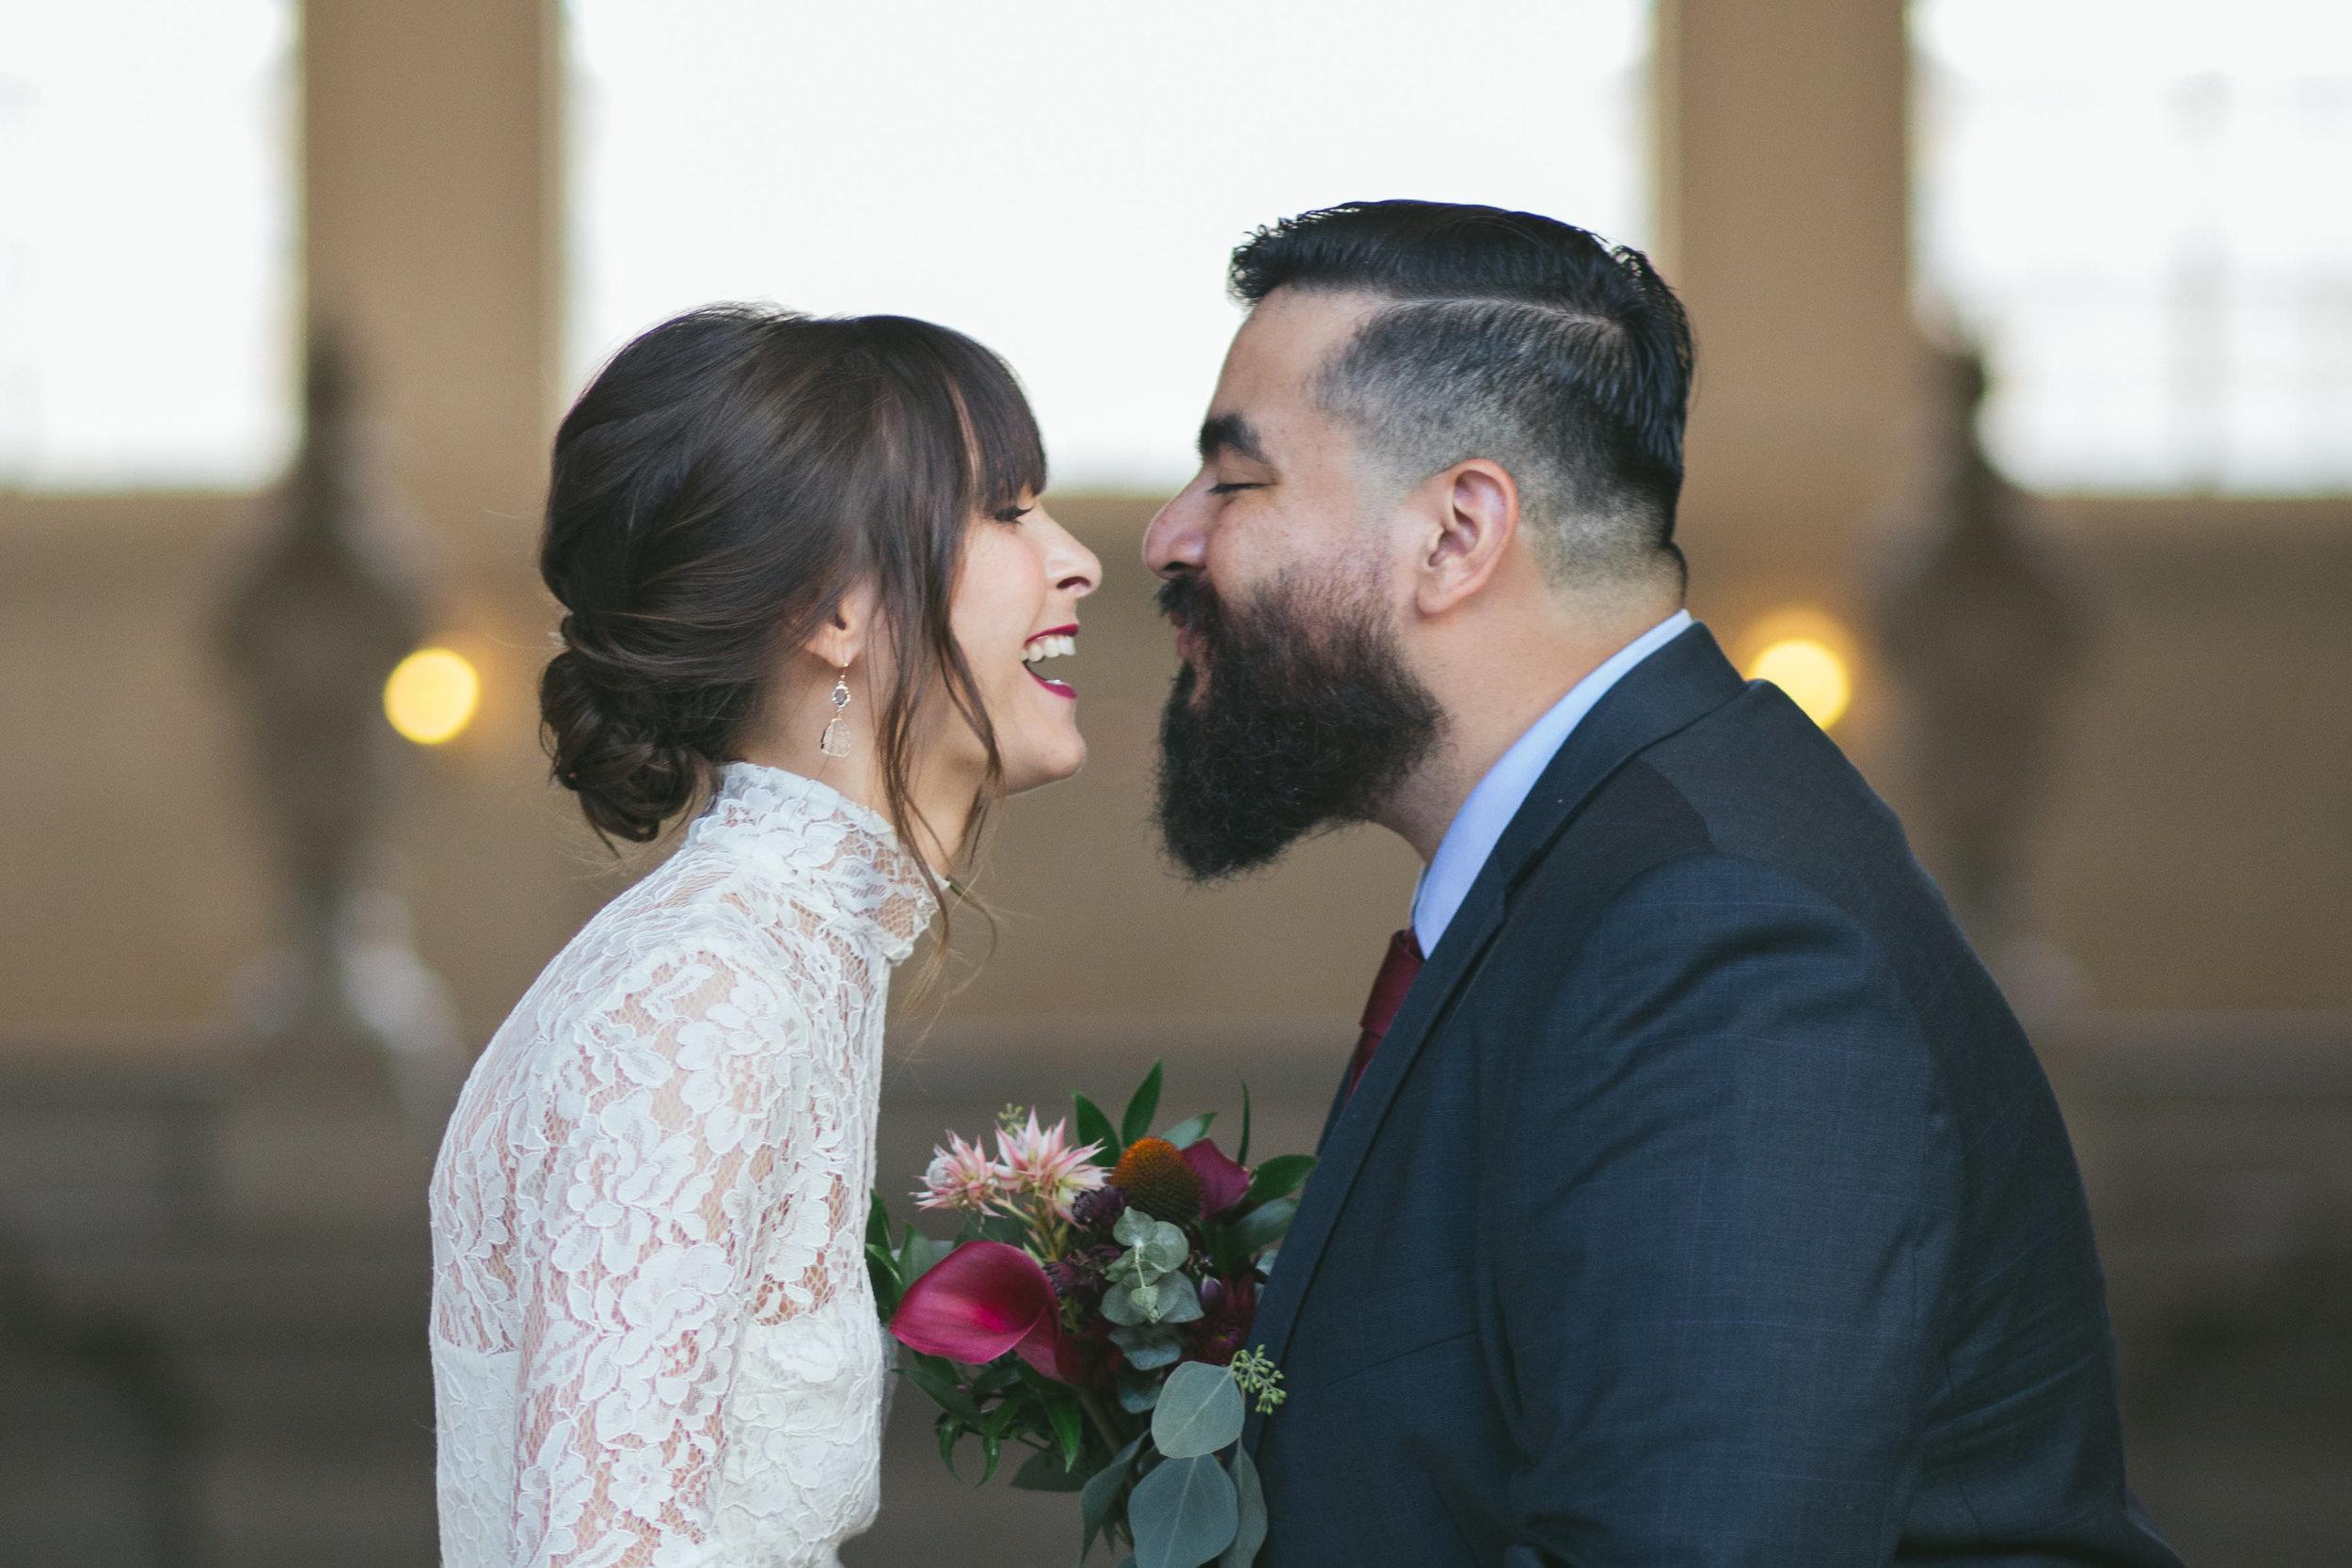 San Francisco City Hall Civil Ceremony / SF Bay Area Wedding Photographer - Natalie & Rogelio